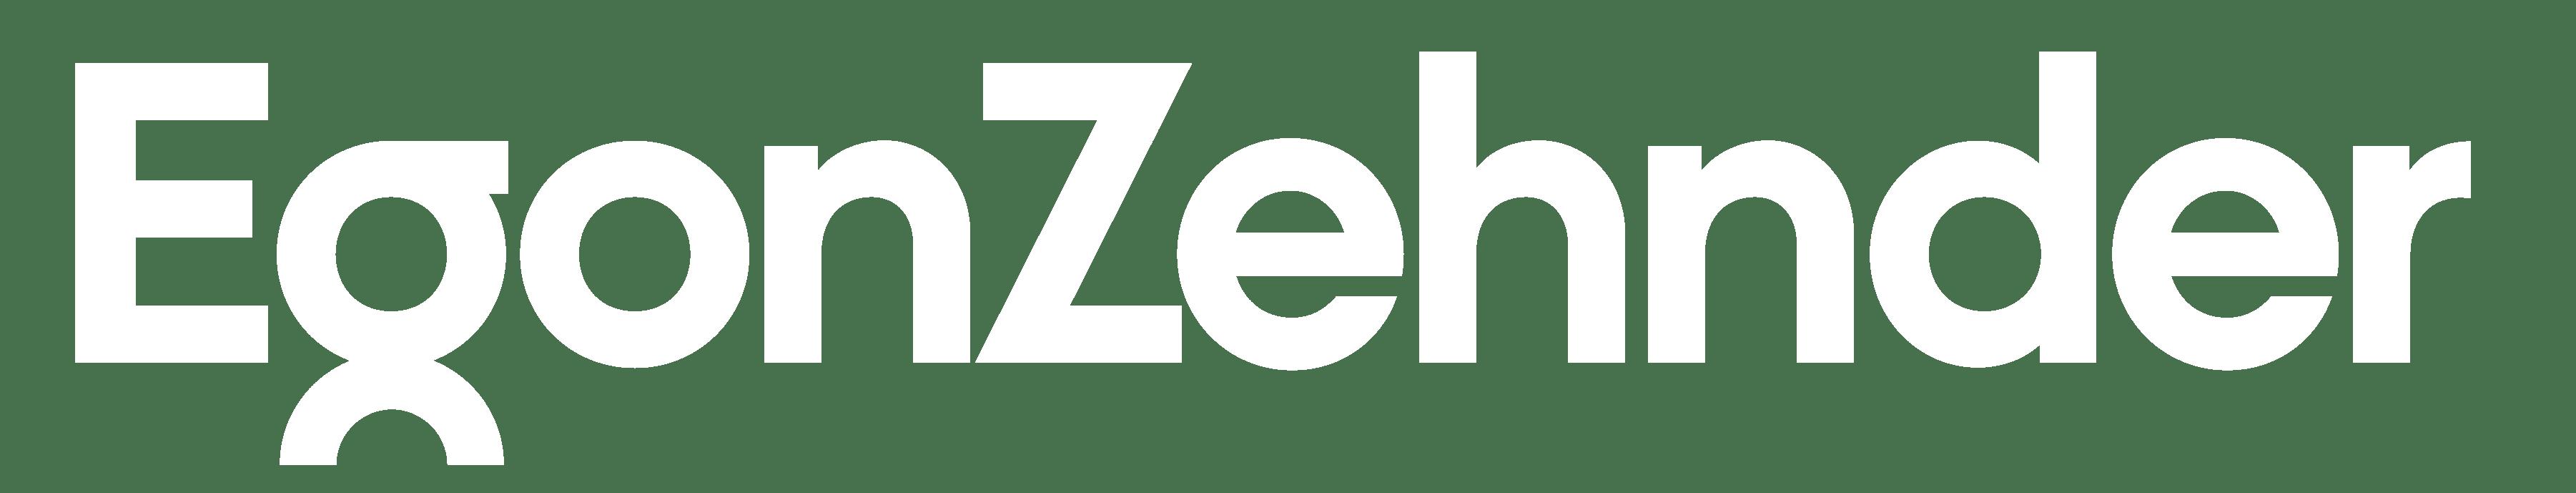 Egon Zehnder Alumni Network